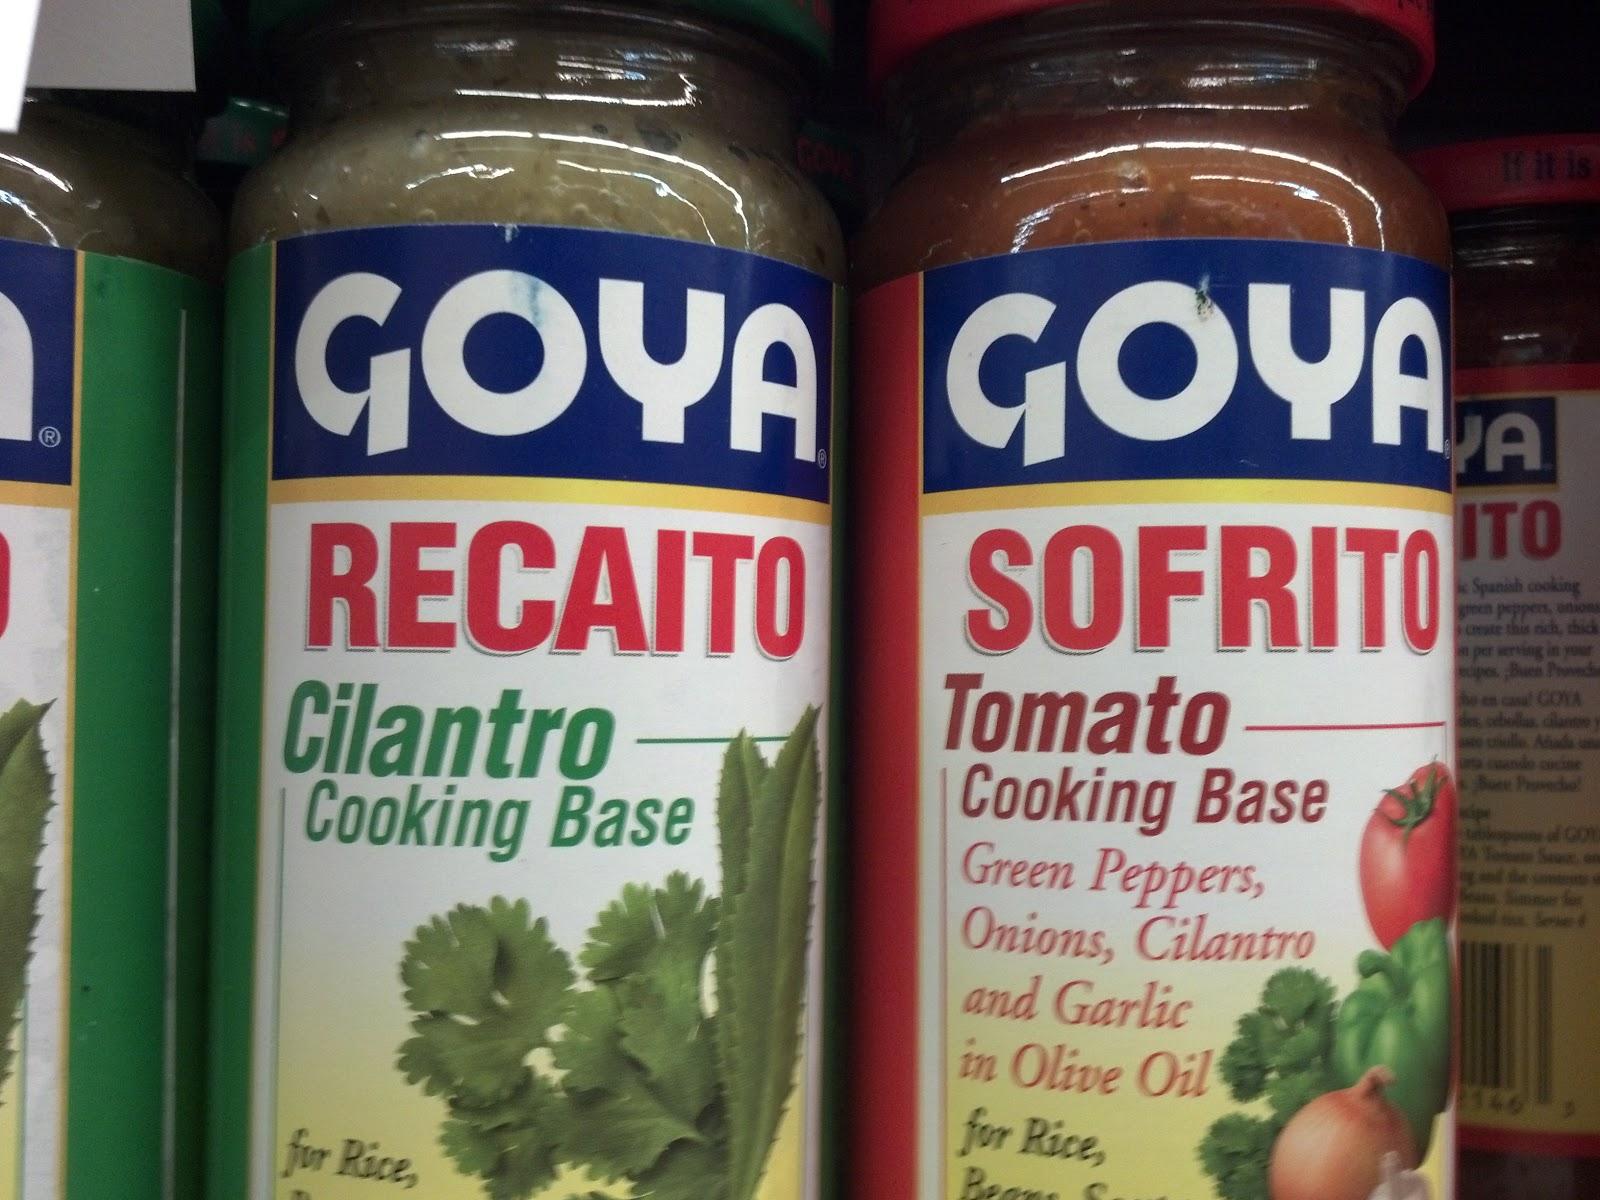 Sofrito - Spanish Seasoning Base - Feel Good Food Blog